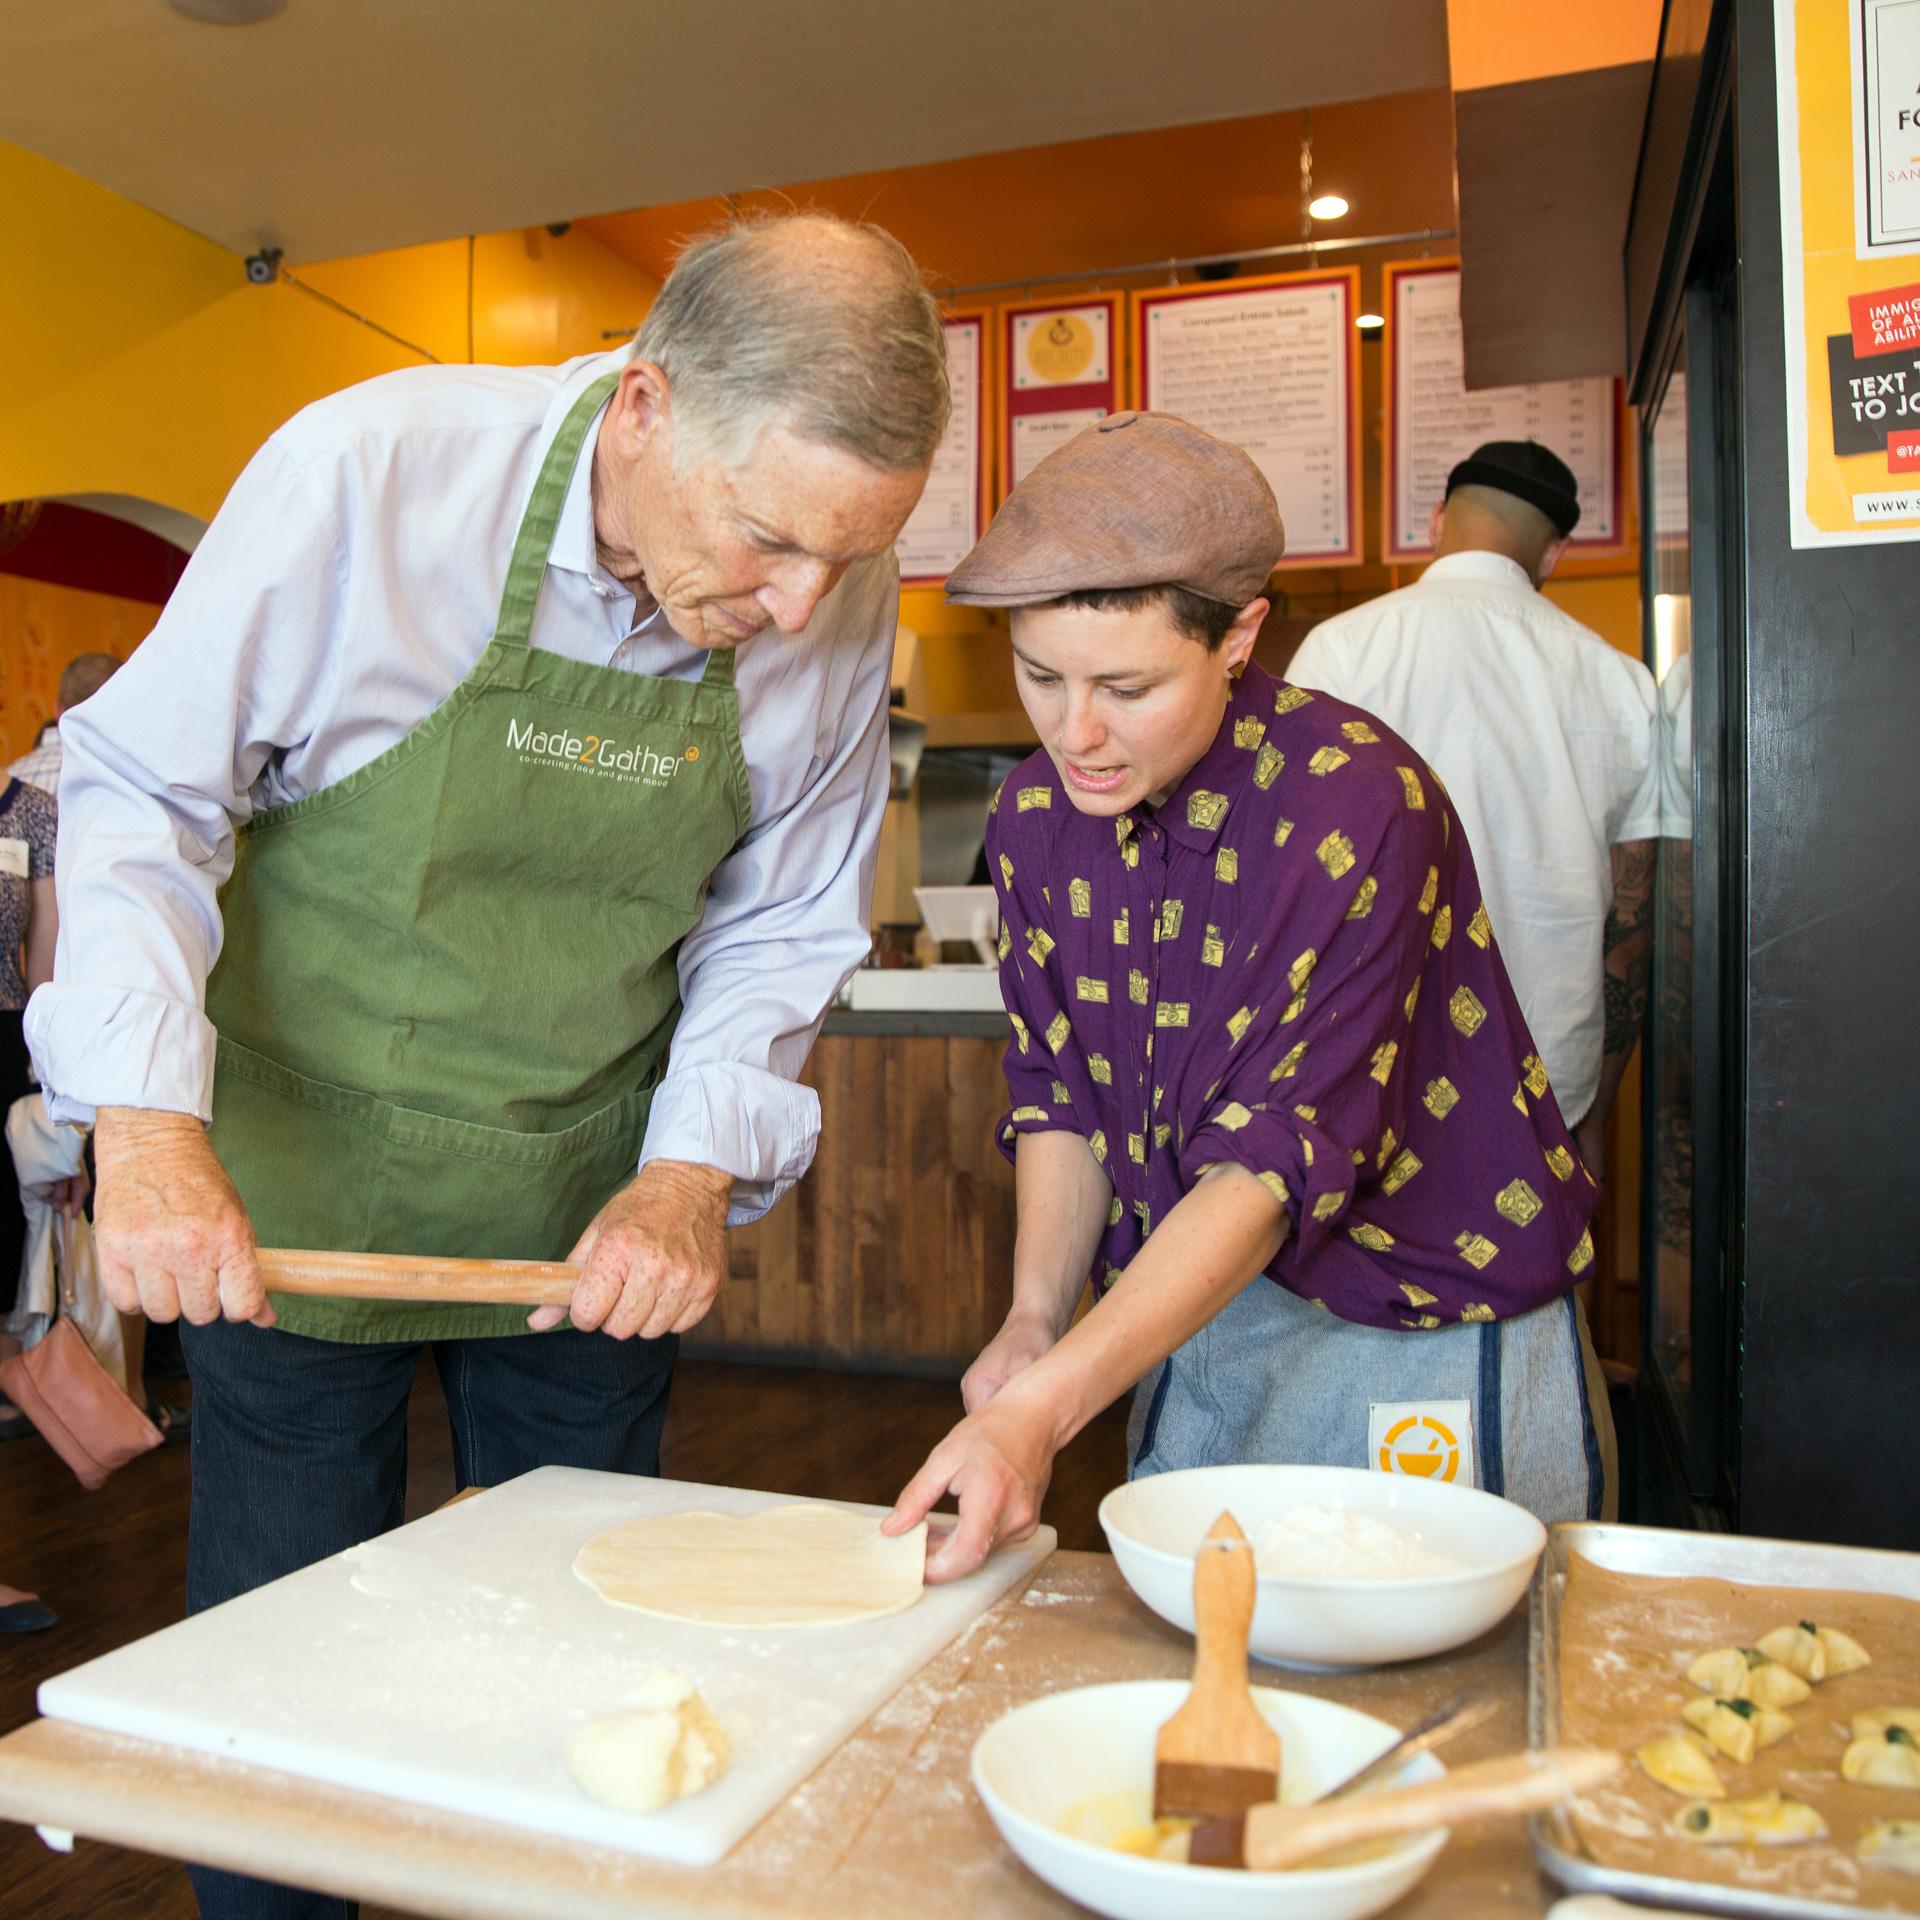 Chef Lee Davidson instructs David Tussman on how to make a fatayer.